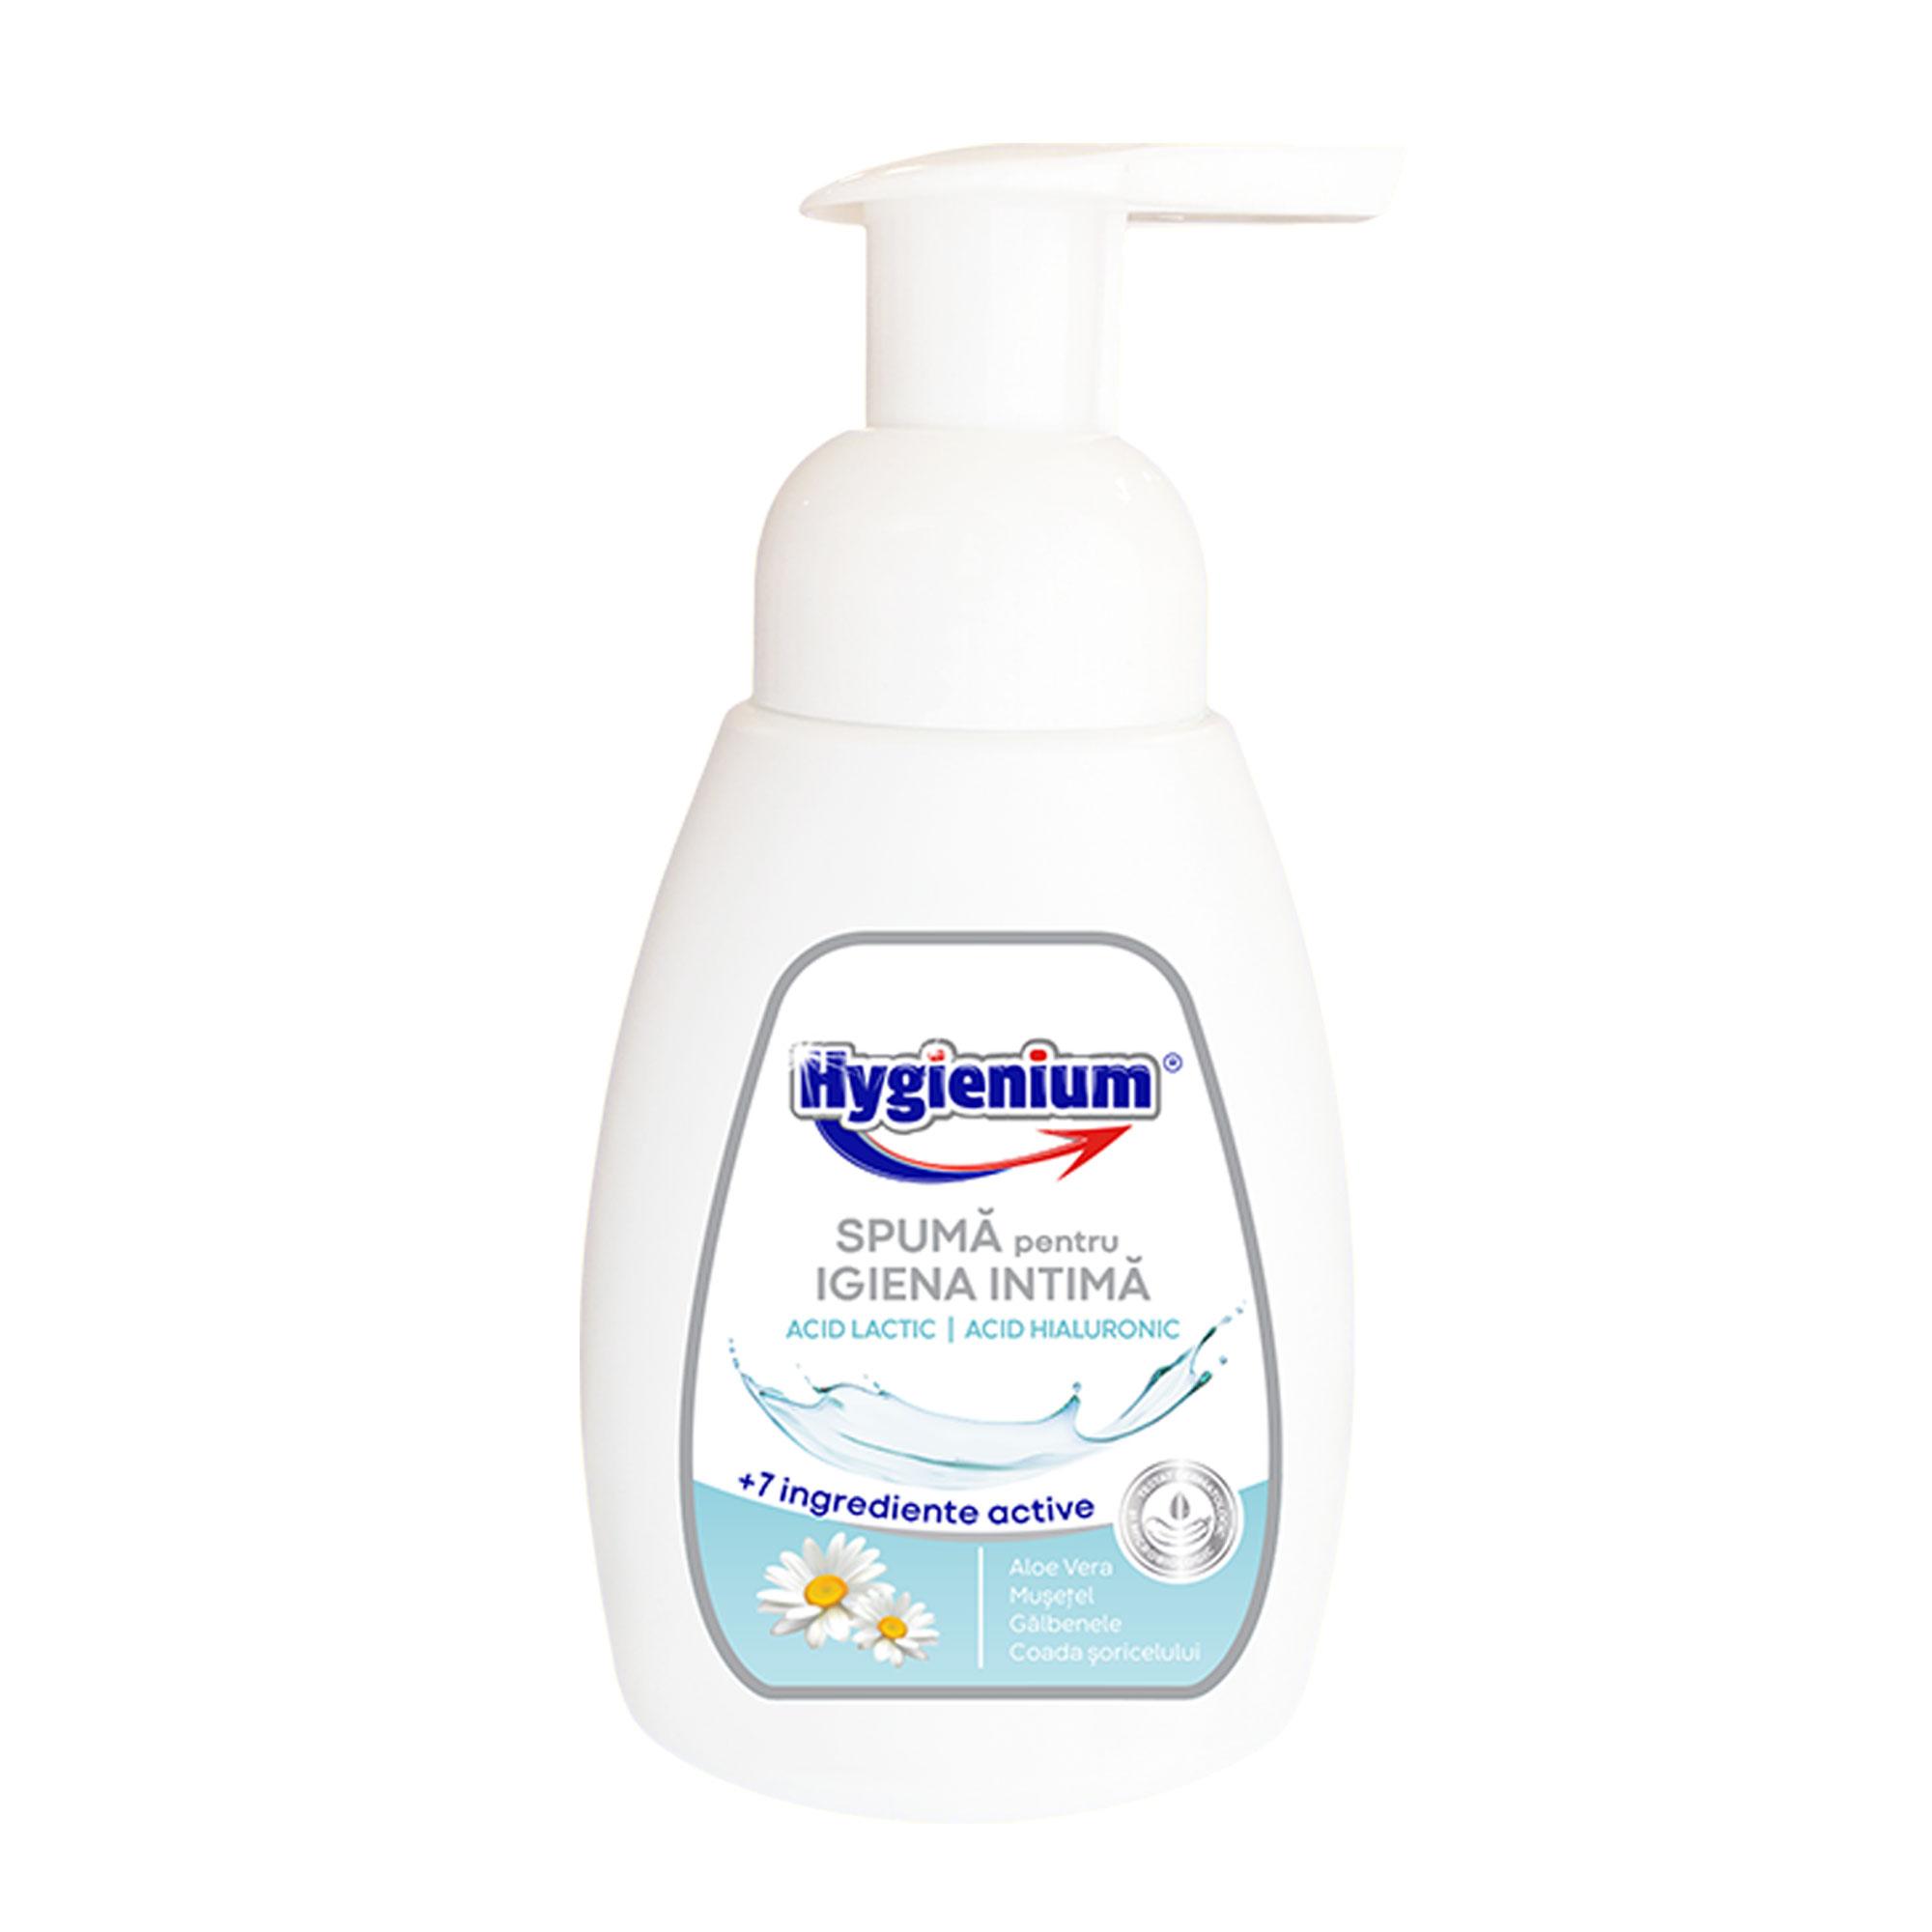 Hygienium Intimate hygiene foam